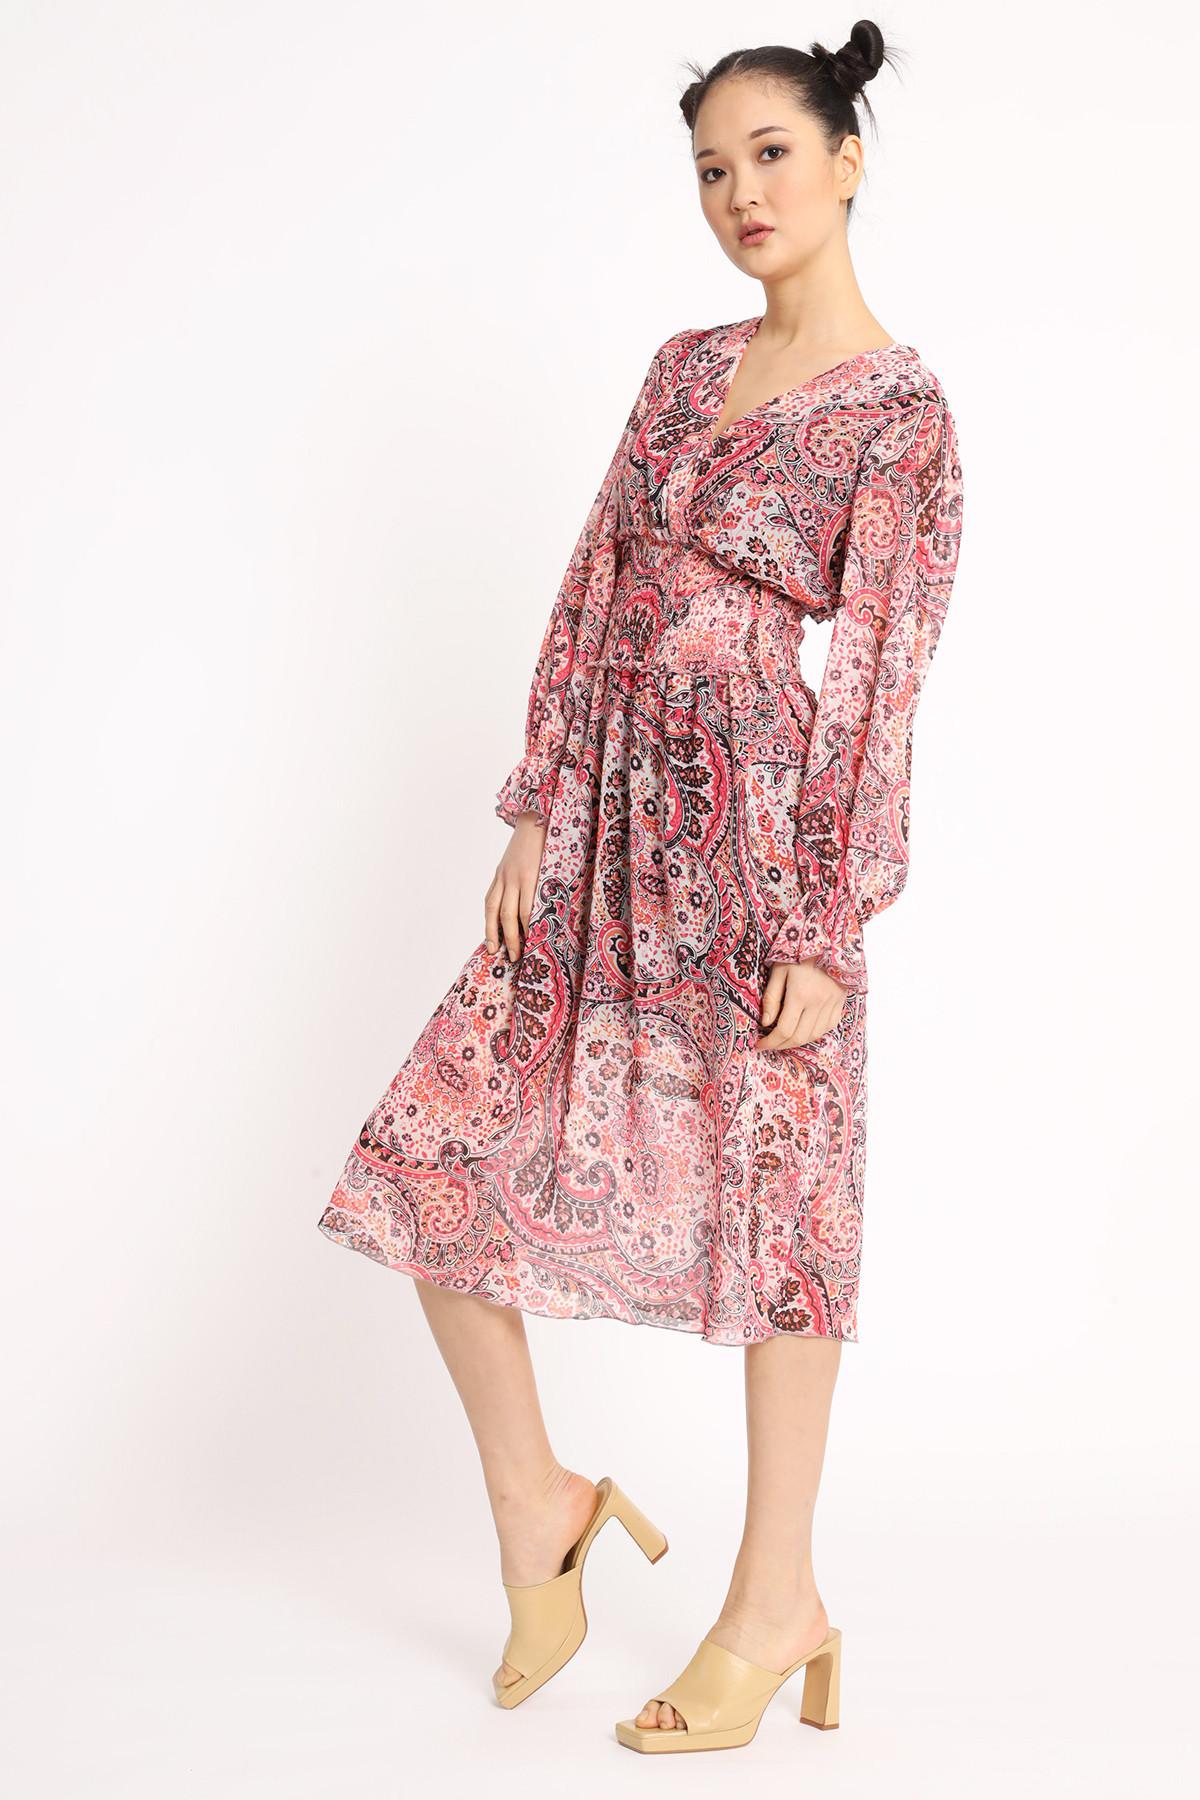 Georgette Fancy Dress with Gathering